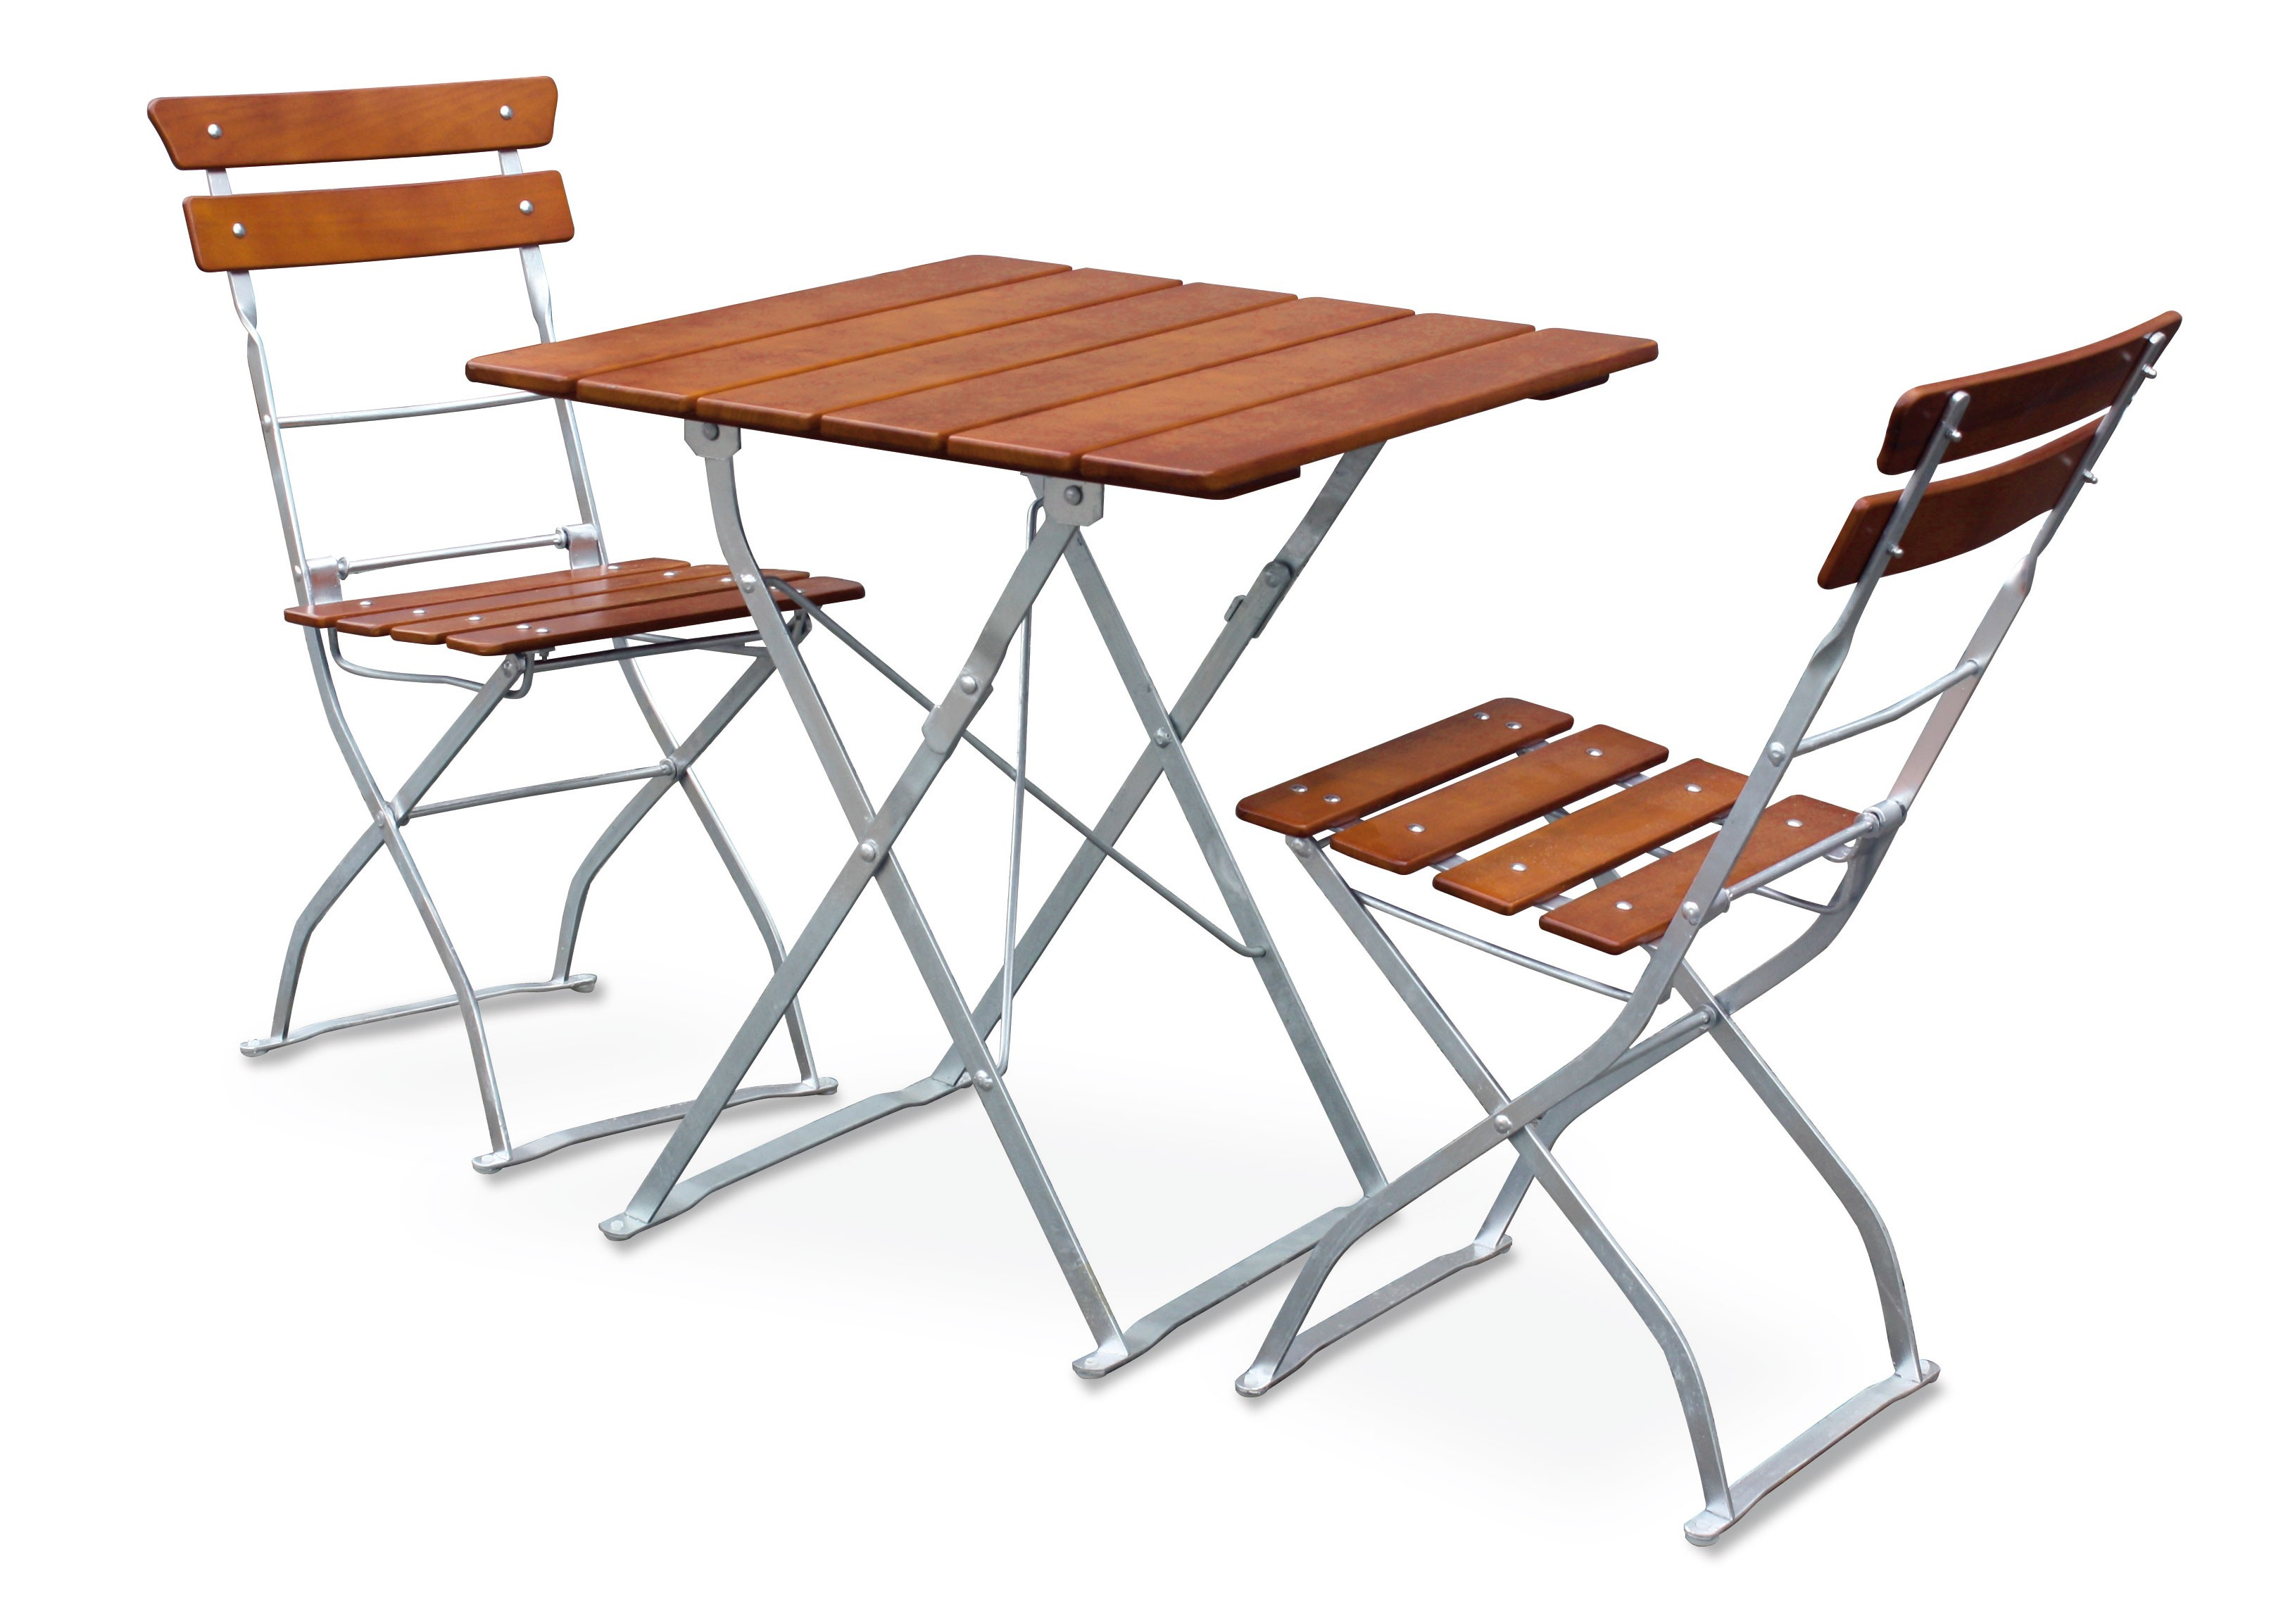 Gartentisch / Biergartentisch klappbar Classic 70 x70cm ocker/verzinkt Bild 2